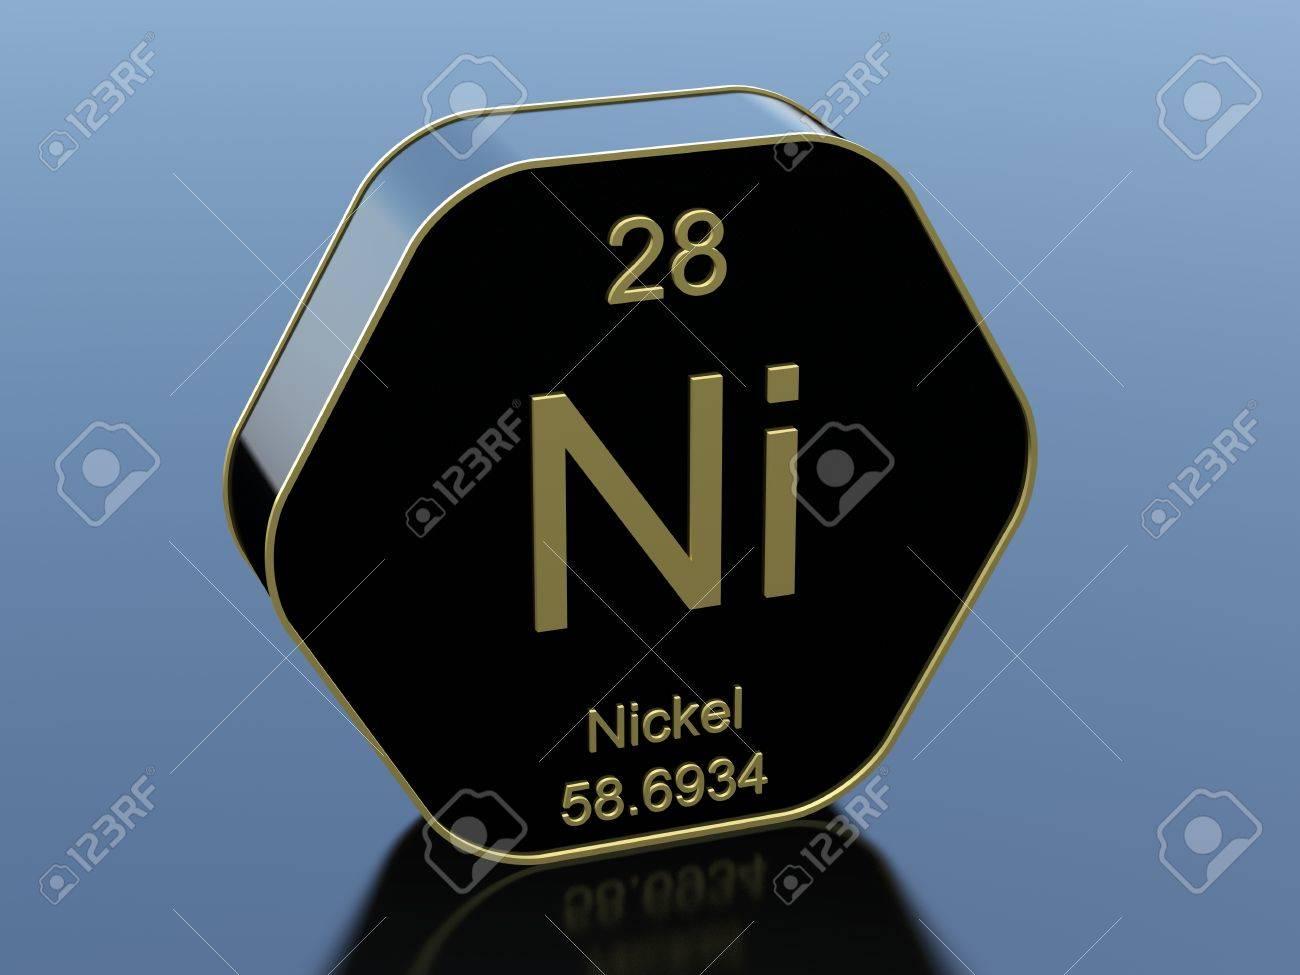 Nickel element symbol on hexagonal black icon stock photo picture nickel element symbol on hexagonal black icon stock photo 65586841 buycottarizona Images